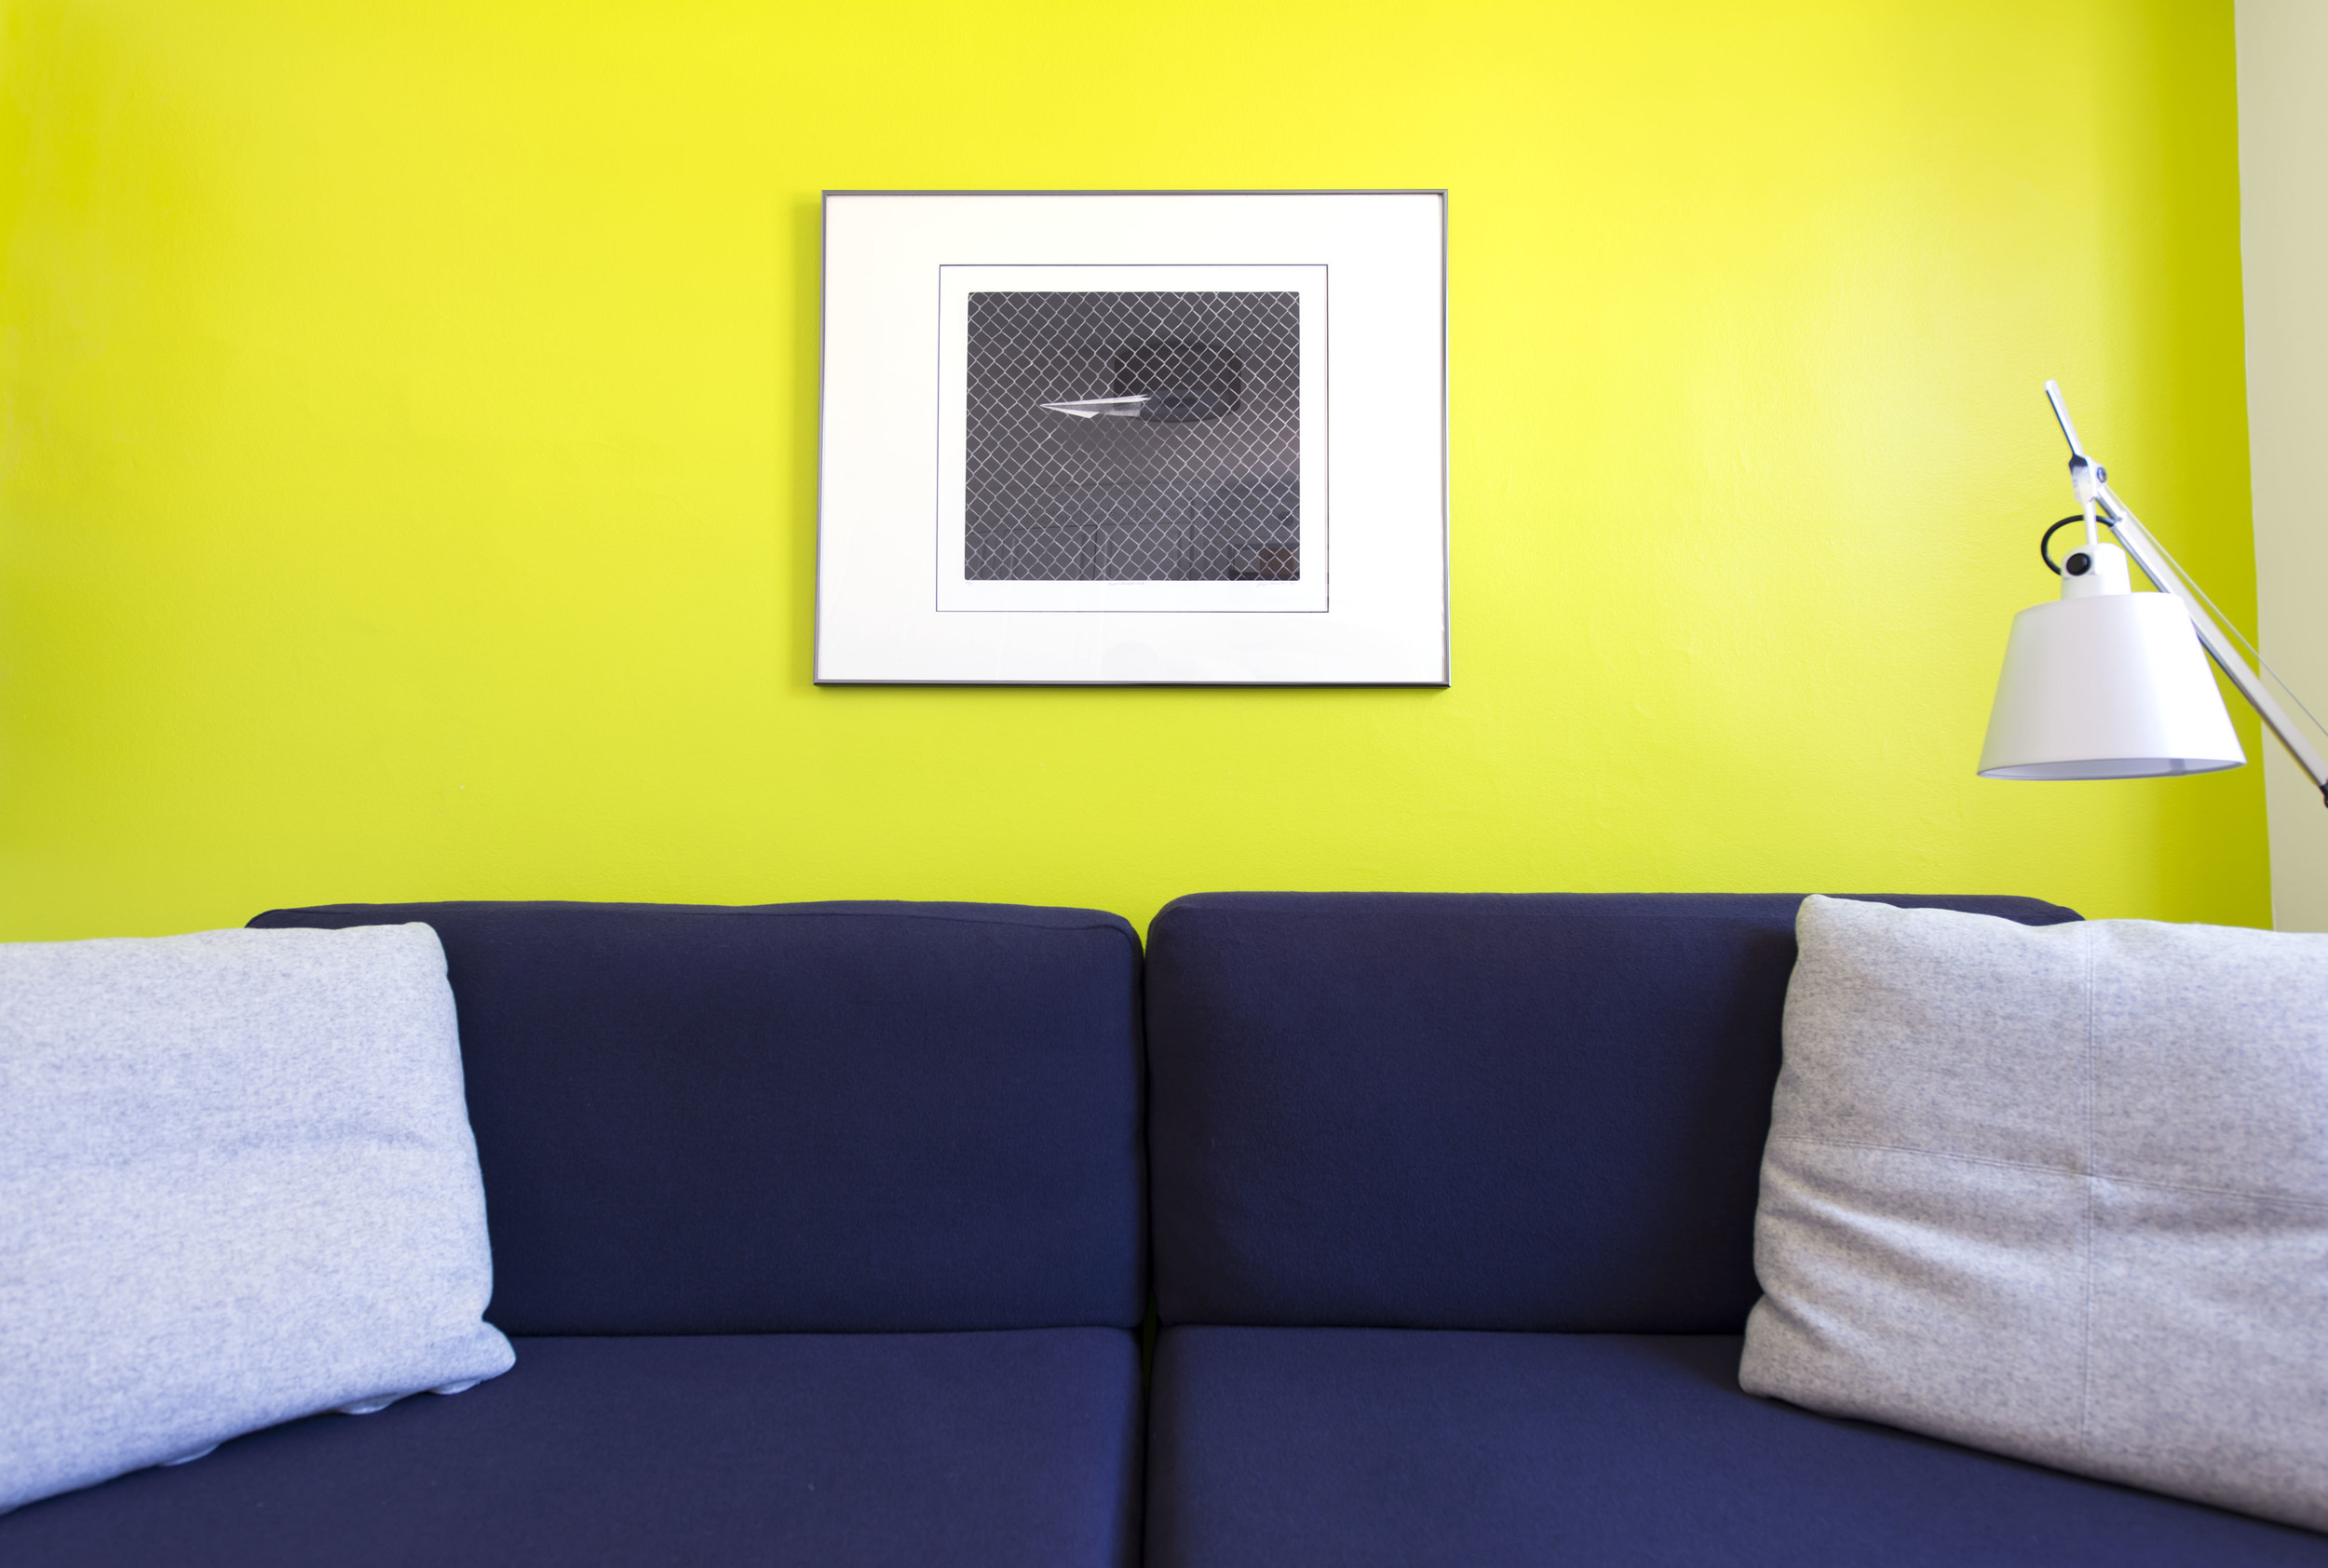 25-TV-Room-Detail-Sofa-4893.jpg